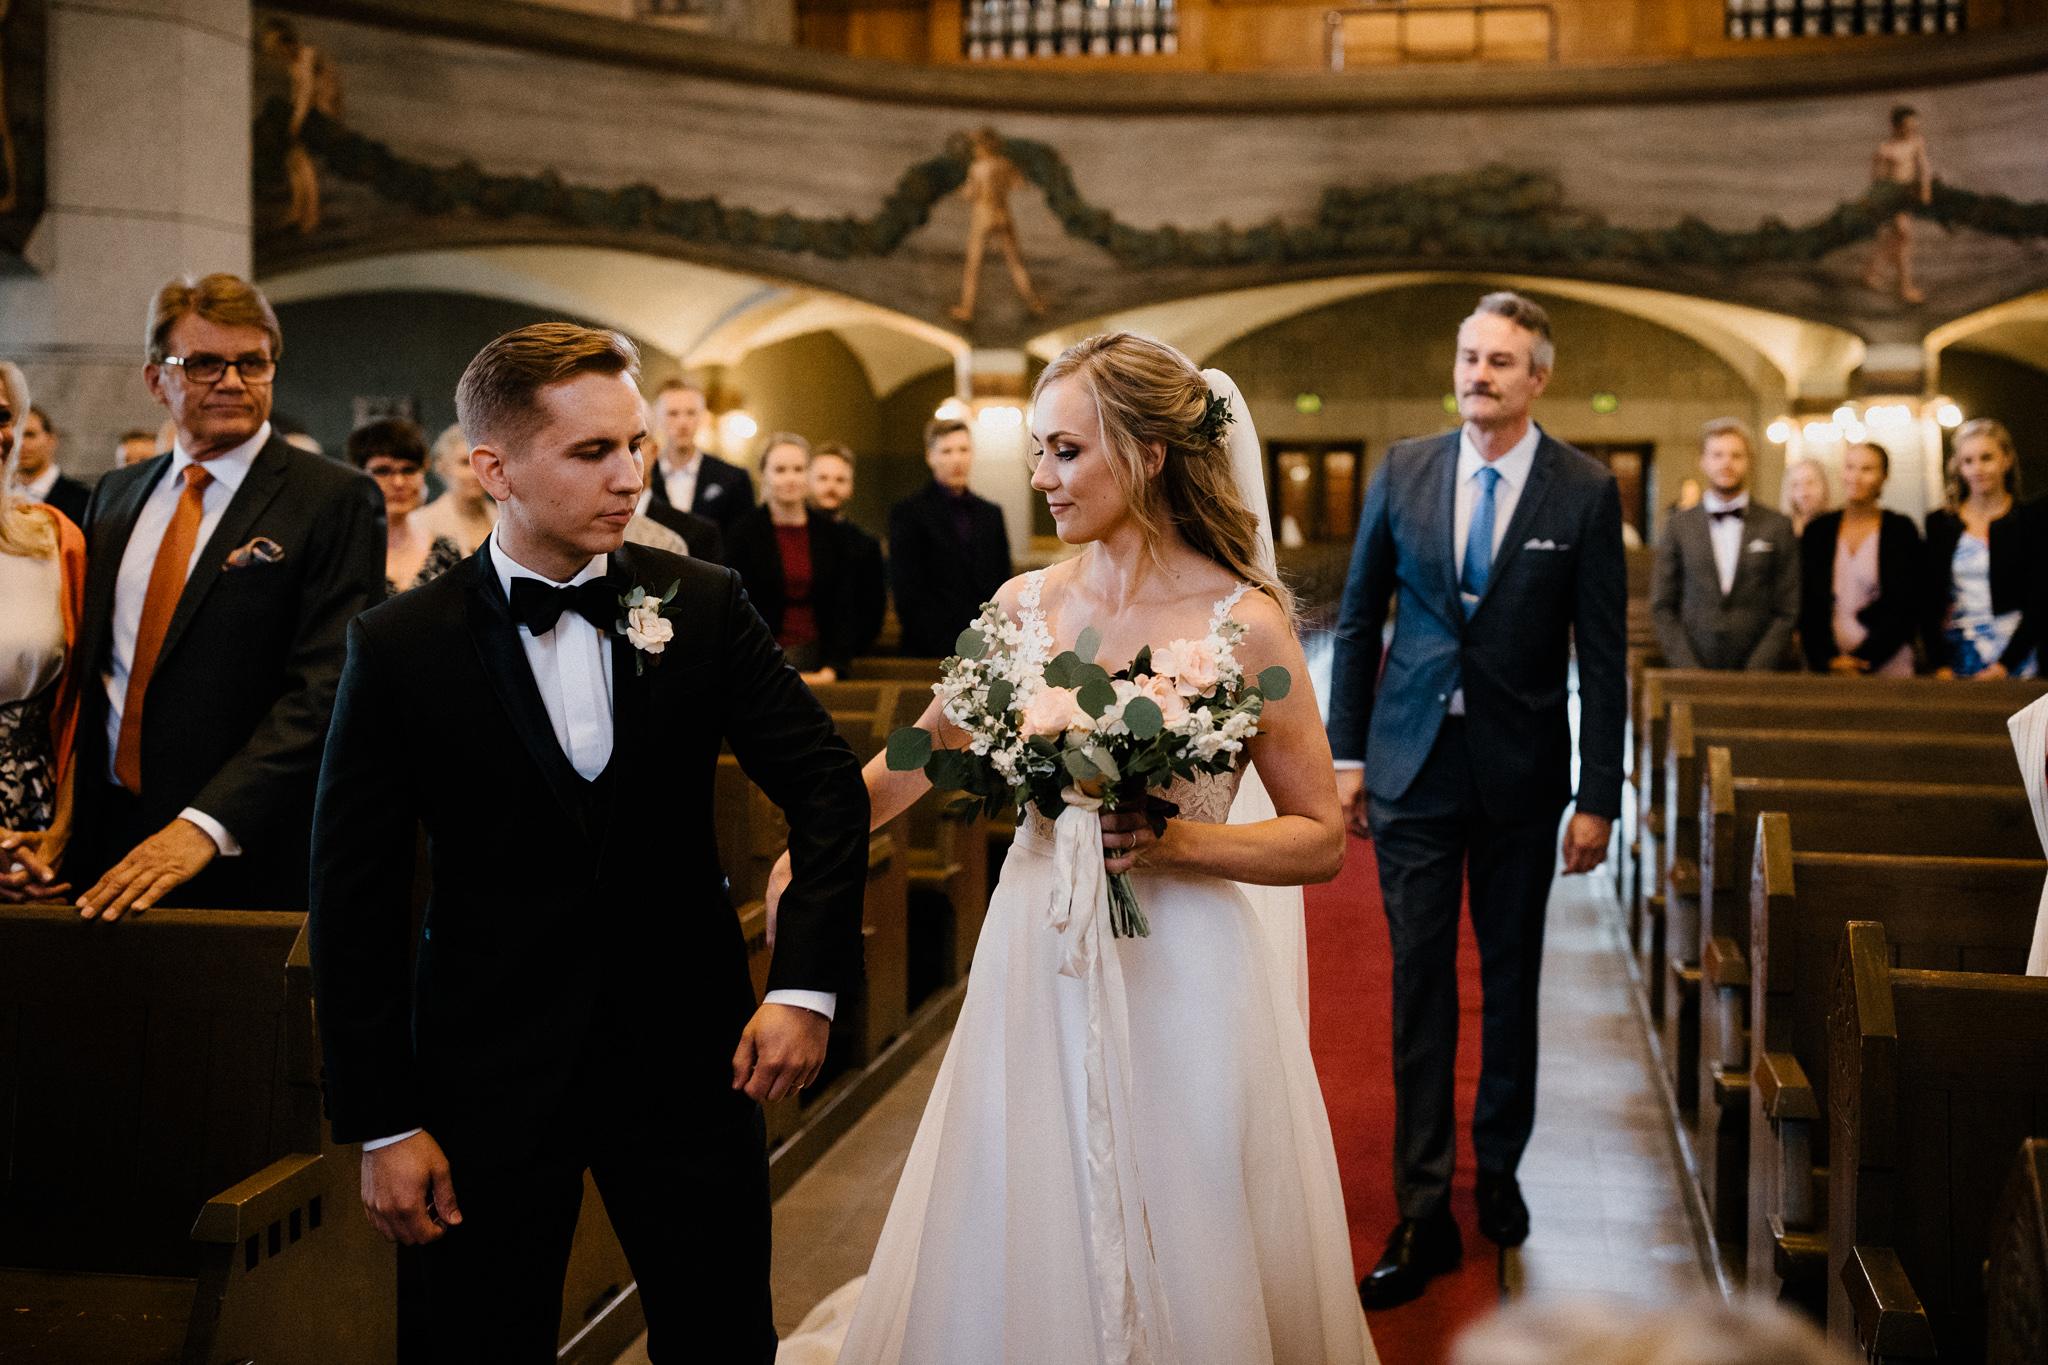 Johanna + Mikko - Tampere - Photo by Patrick Karkkolainen Wedding Photographer-62.jpg